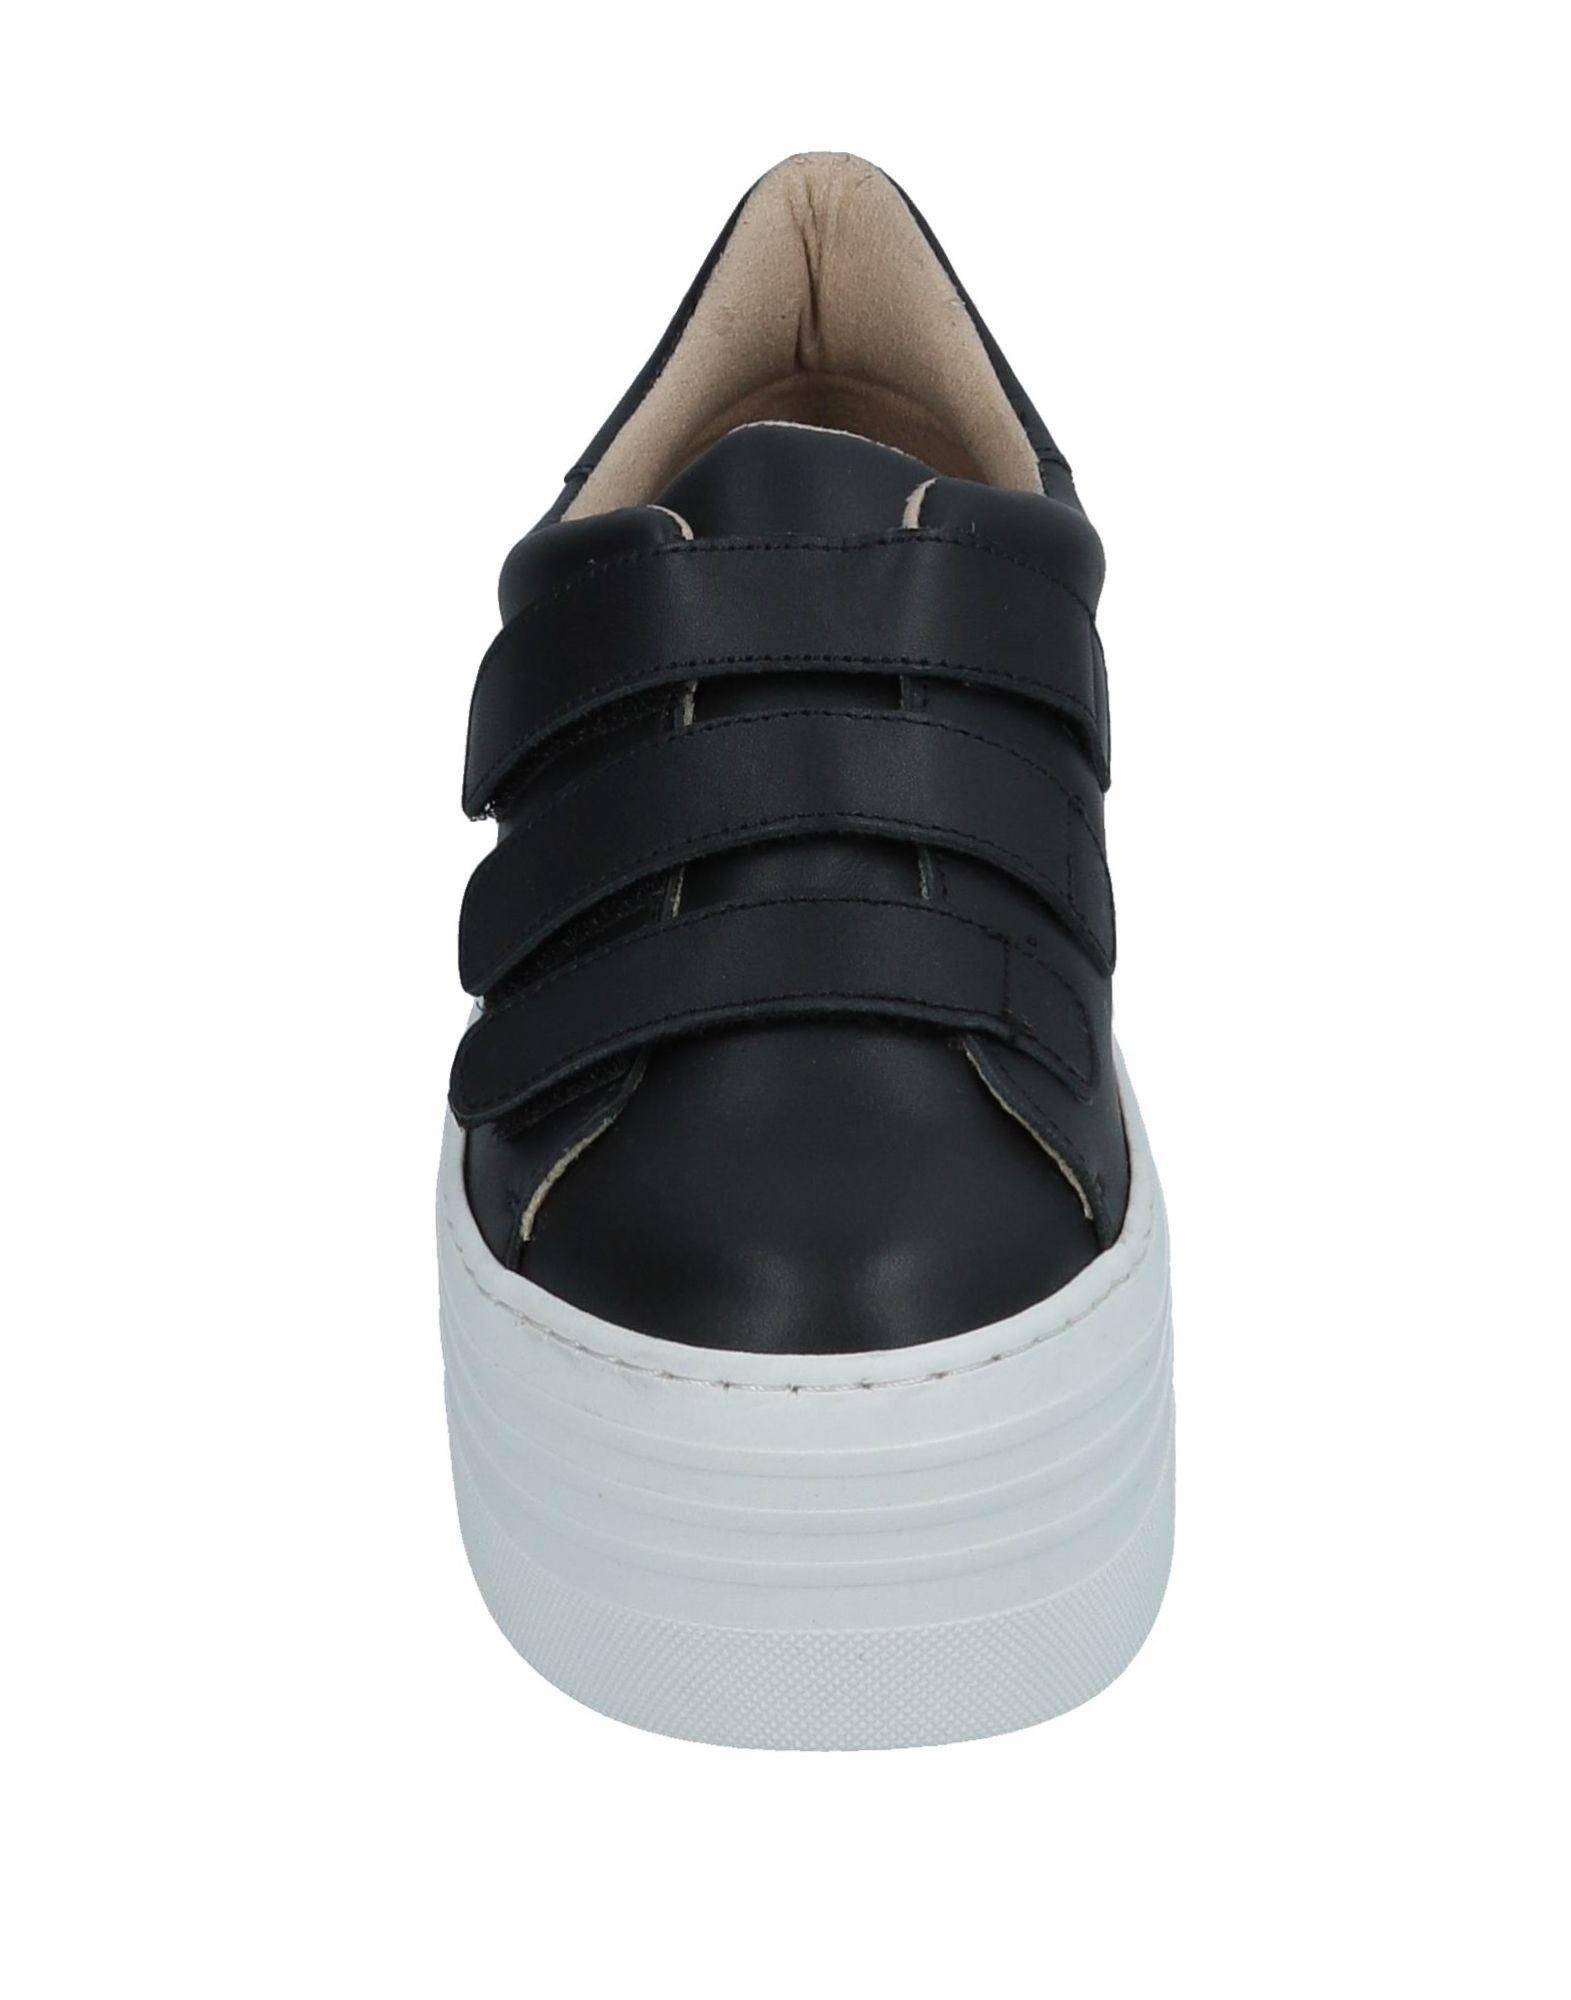 Flavio Creation Turnschuhes Damen Schuhe 11552961SO Gute Qualität beliebte Schuhe Damen 20aca6